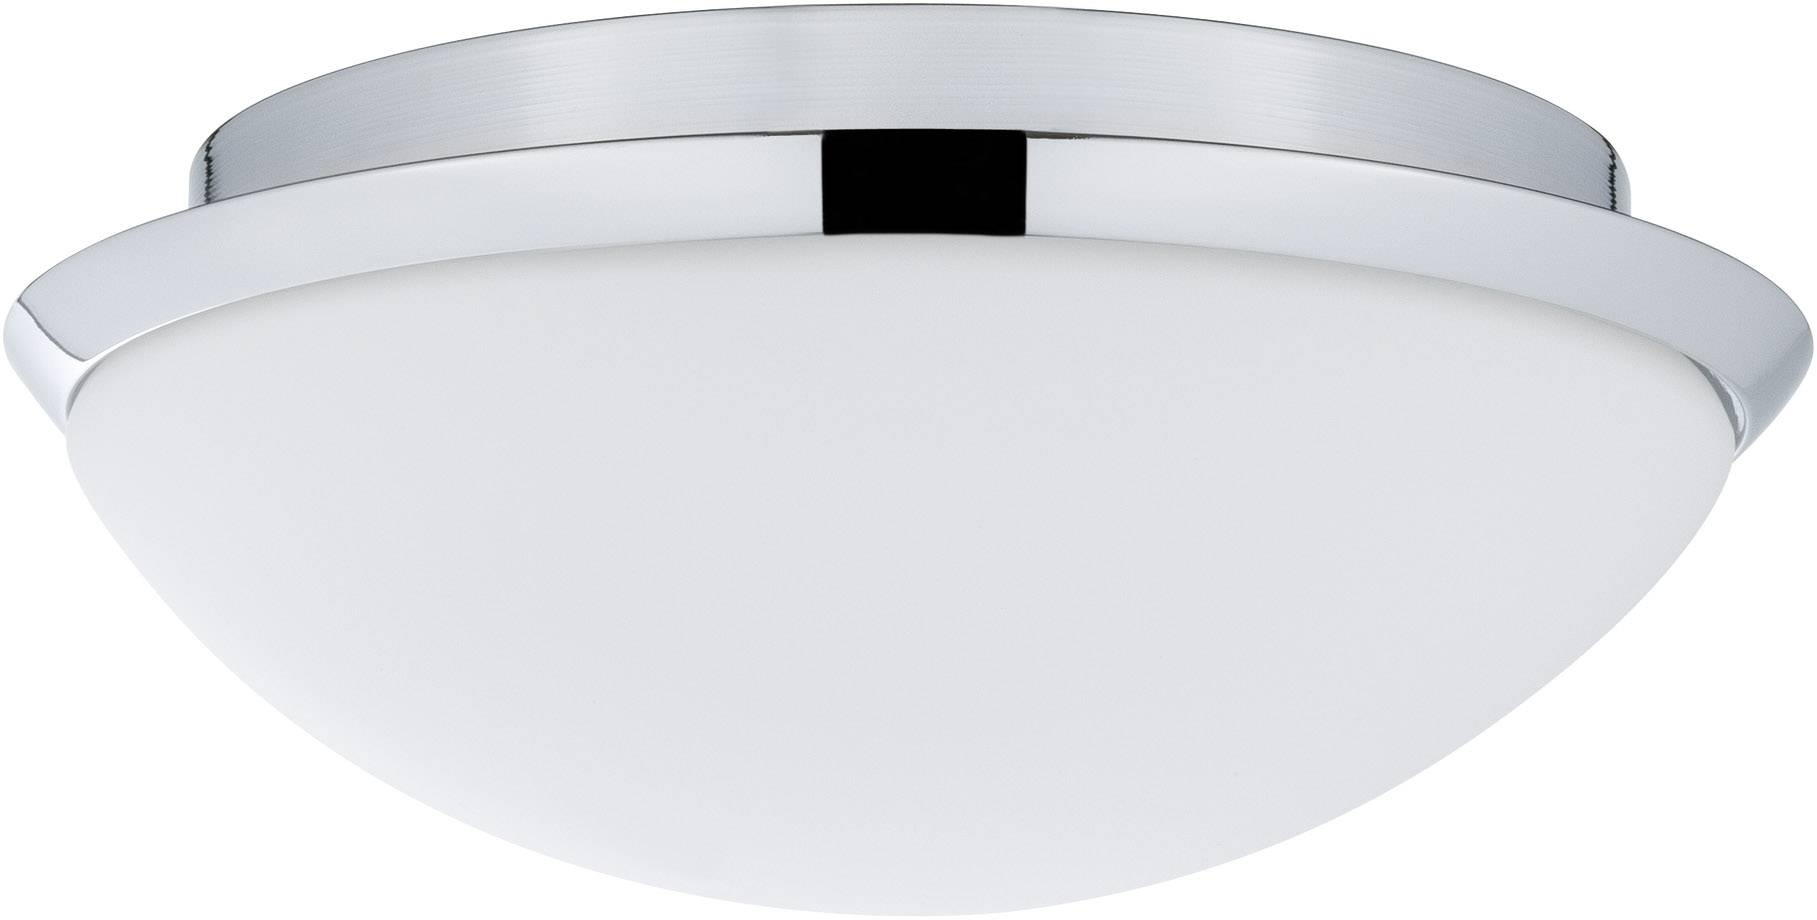 Badkamer Plafondlamp Led : Badkamer plafondlamp led e w paulmann biabo chroom